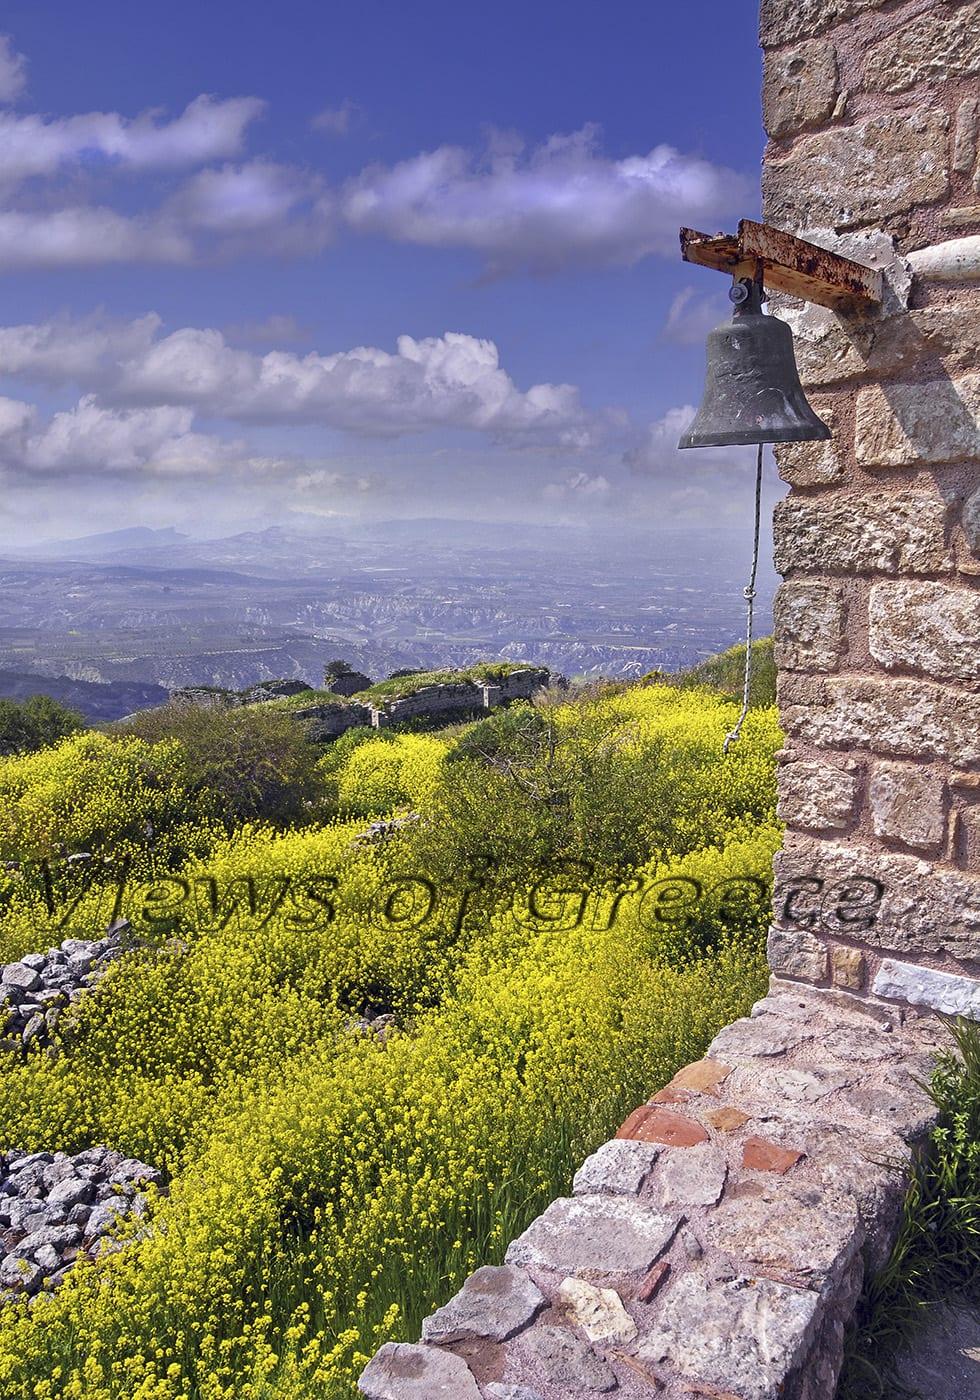 historic, greek, greece, touristic, corinth, peloponnese, akrokorinthos, korinth, peloponnesus, peloponnisos, korinthos, temple, fortress, Venetian, medieval, castle, Ακροκορινθος, κάστρο, Πελοπόννησος, Κορινθία, Φραγκοκρατία, άνοιξη, αρχαιολογικός χώρος